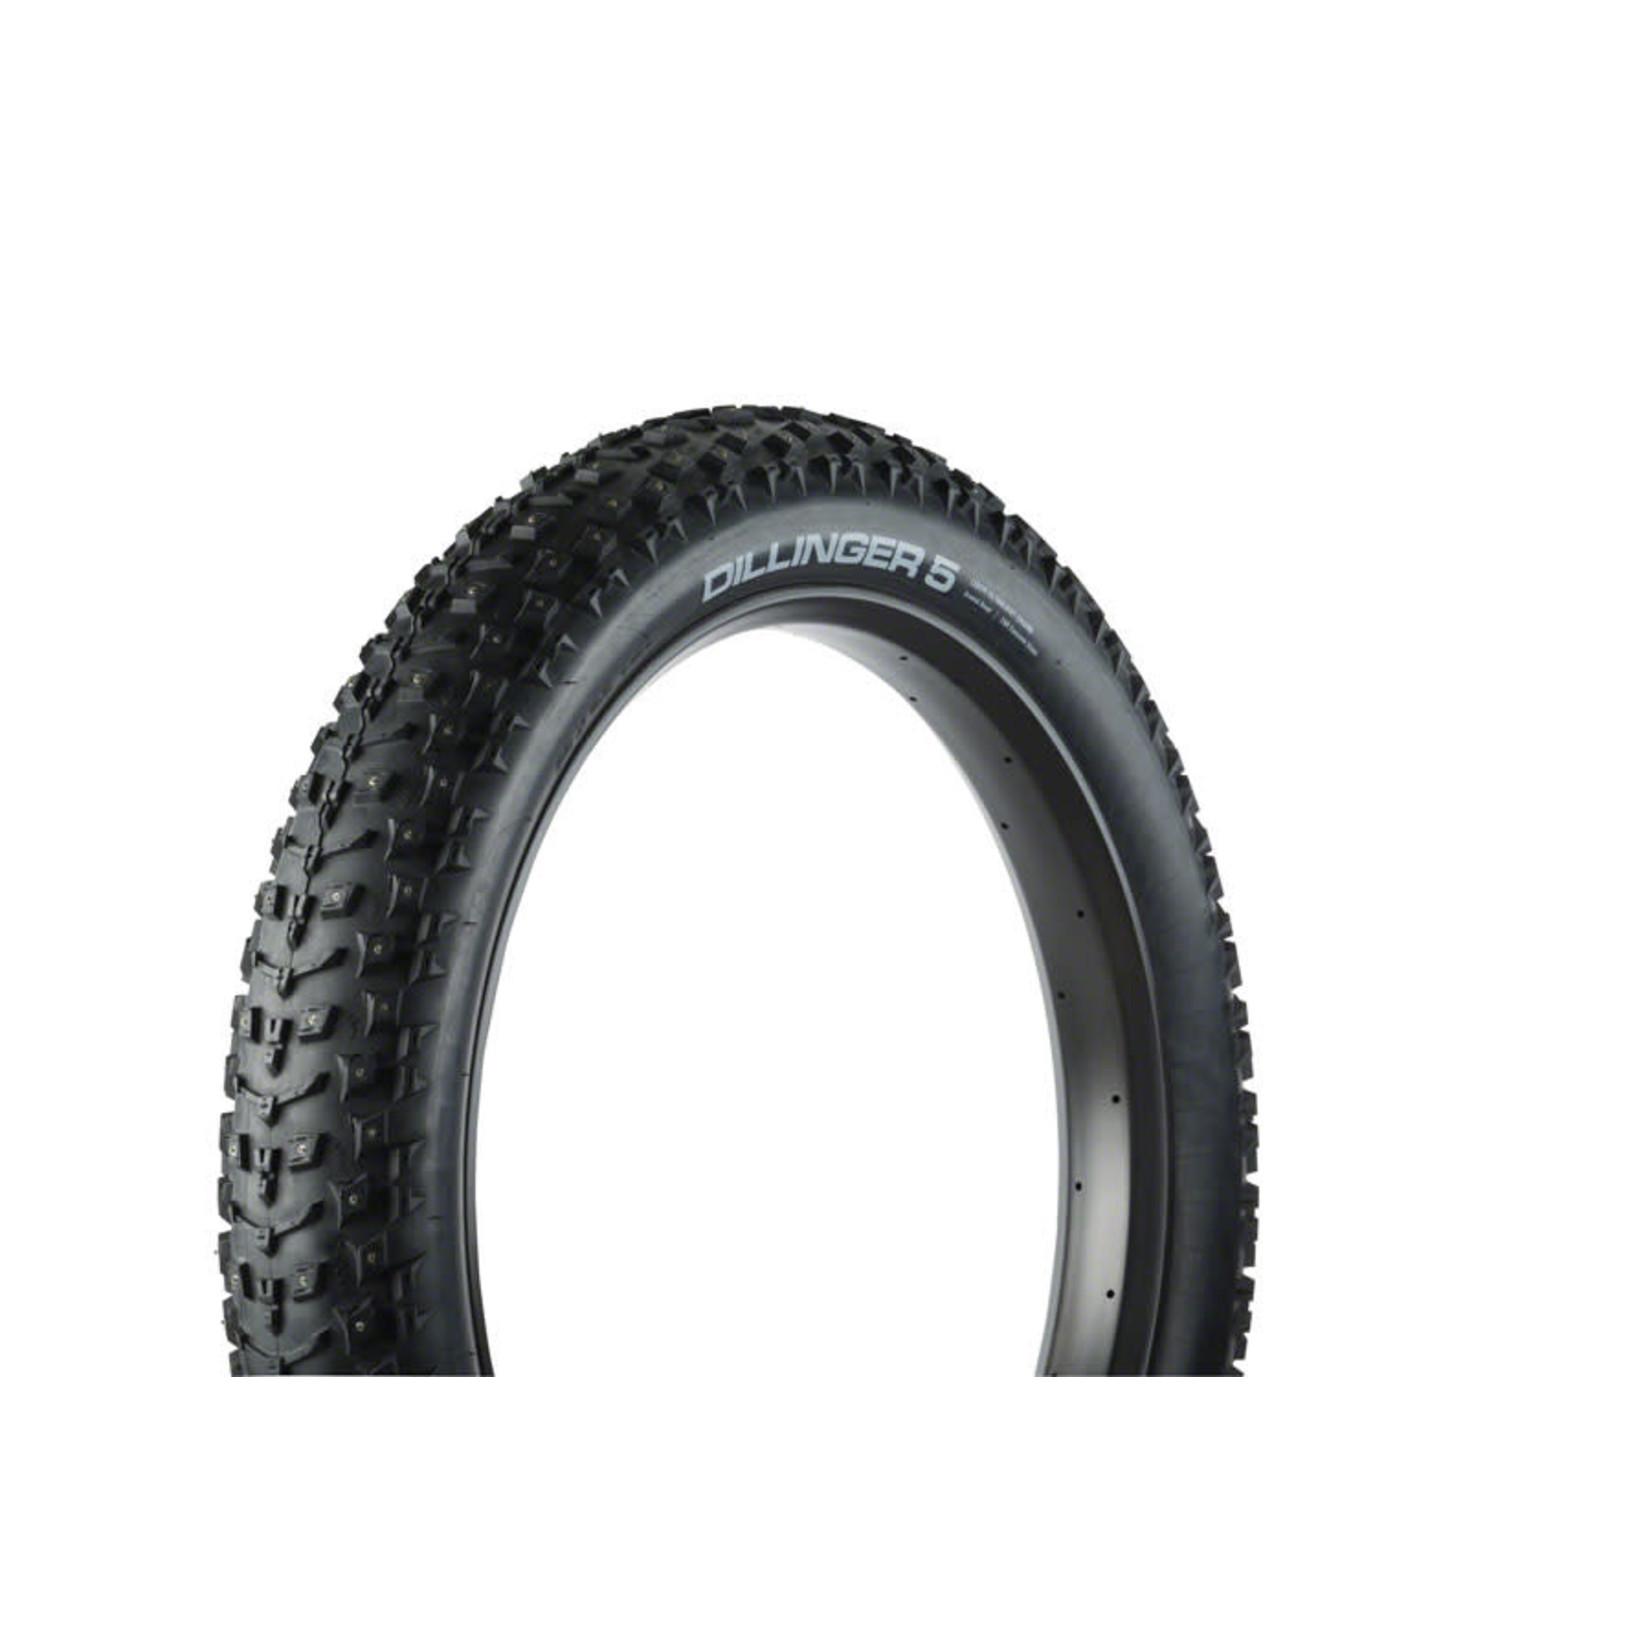 45NRTH 45NRTH Dillinger 5 Tire 120tpi Folding